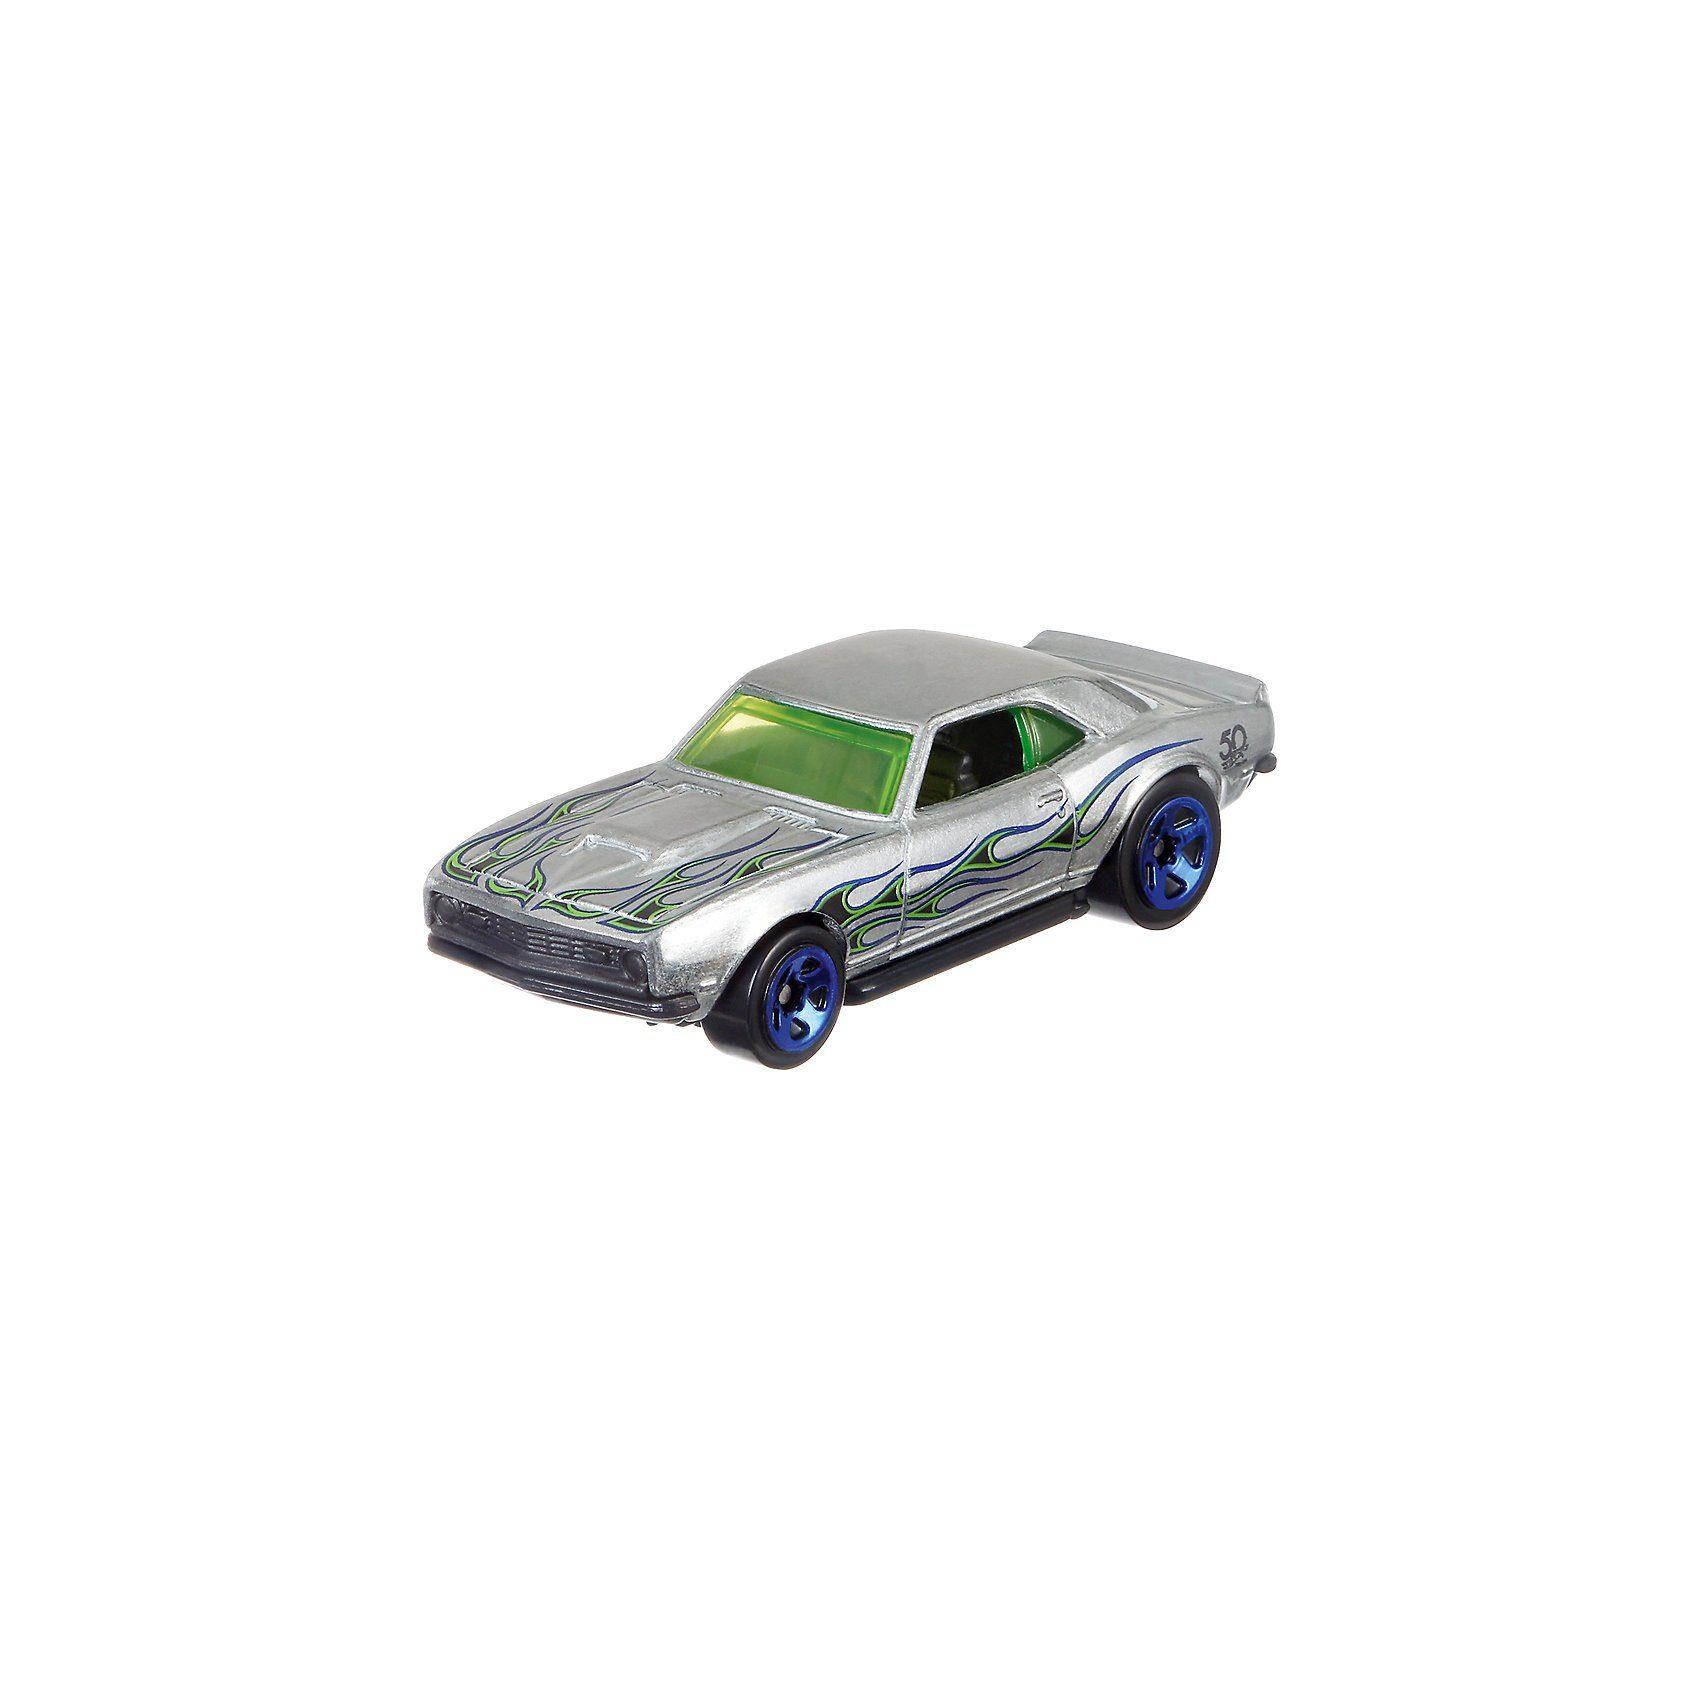 Mattel® Hot Wheels 50th Anniversary Zamac Themed Sortiment - 1 Fahrz